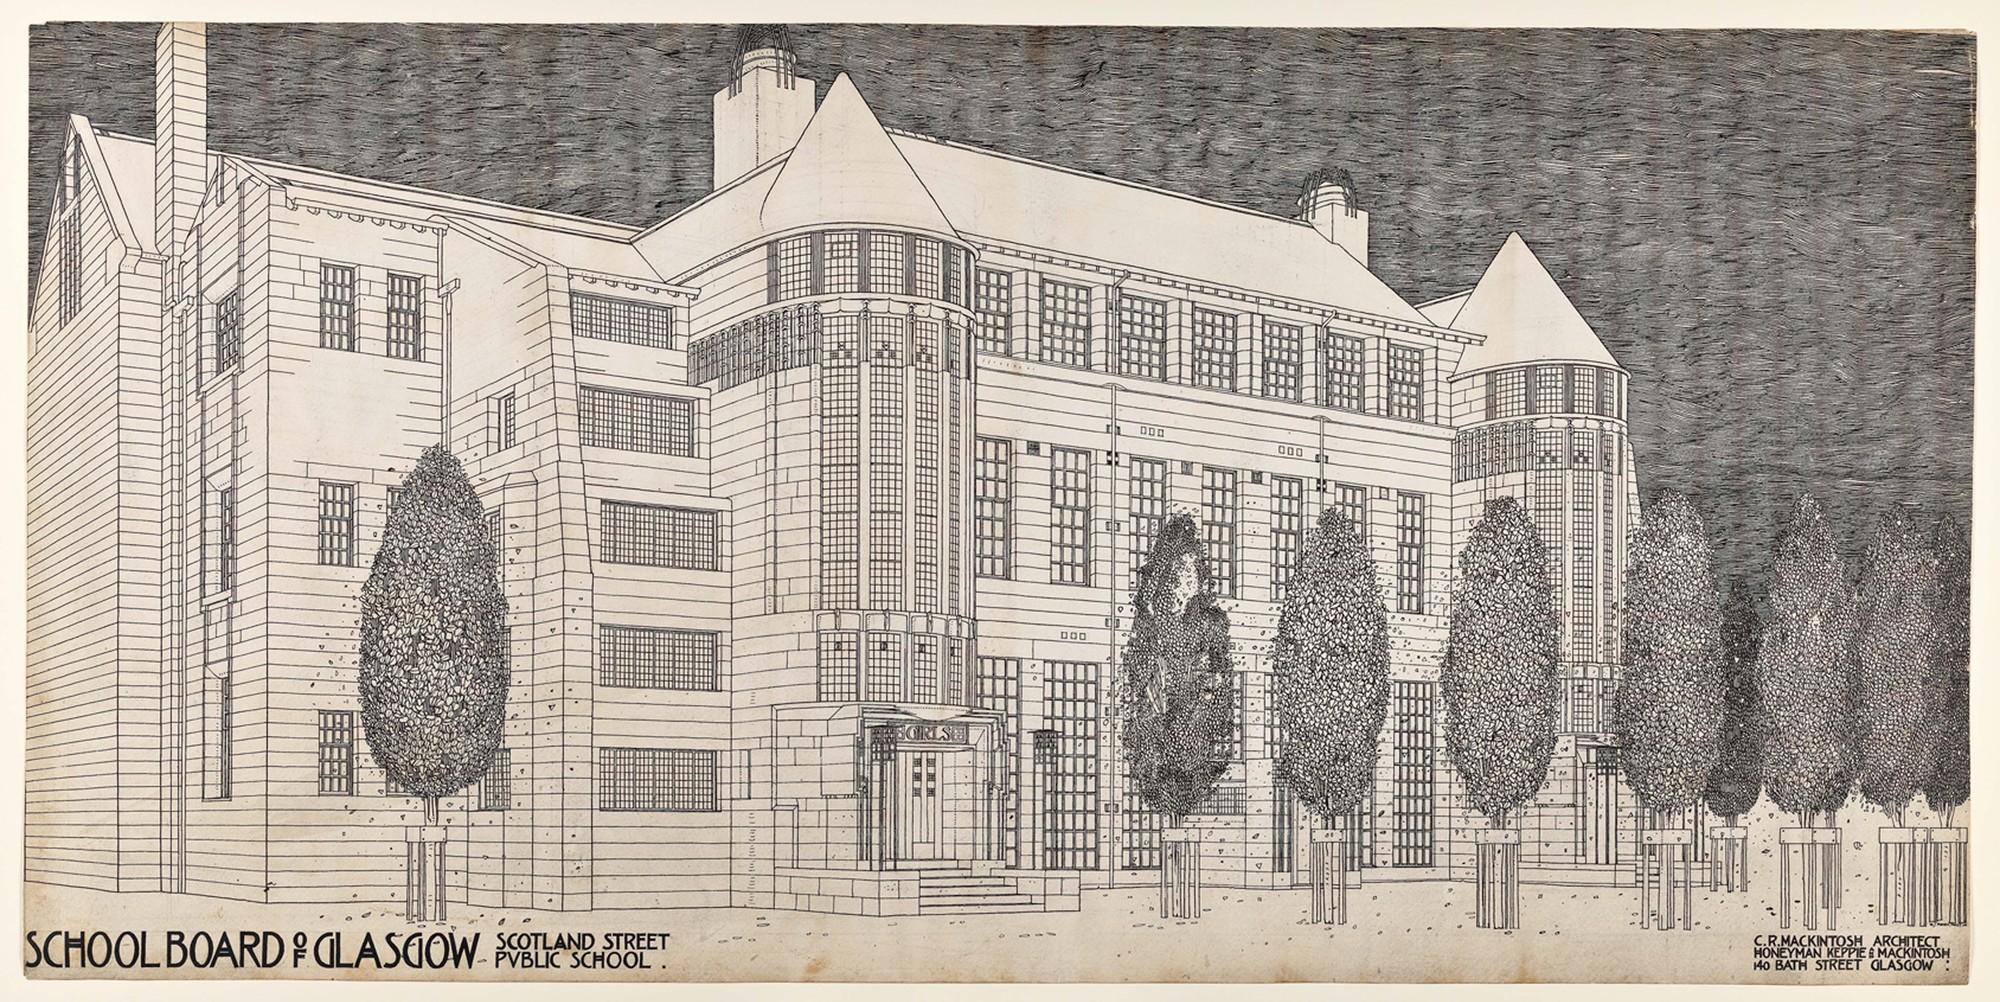 RIBA Announces Charles Rennie Mackintosh Retrospective for 2015, Design for Scotland Street School by Charles Rennie Mackintosh. Image © Hunterian, University of Glasgow